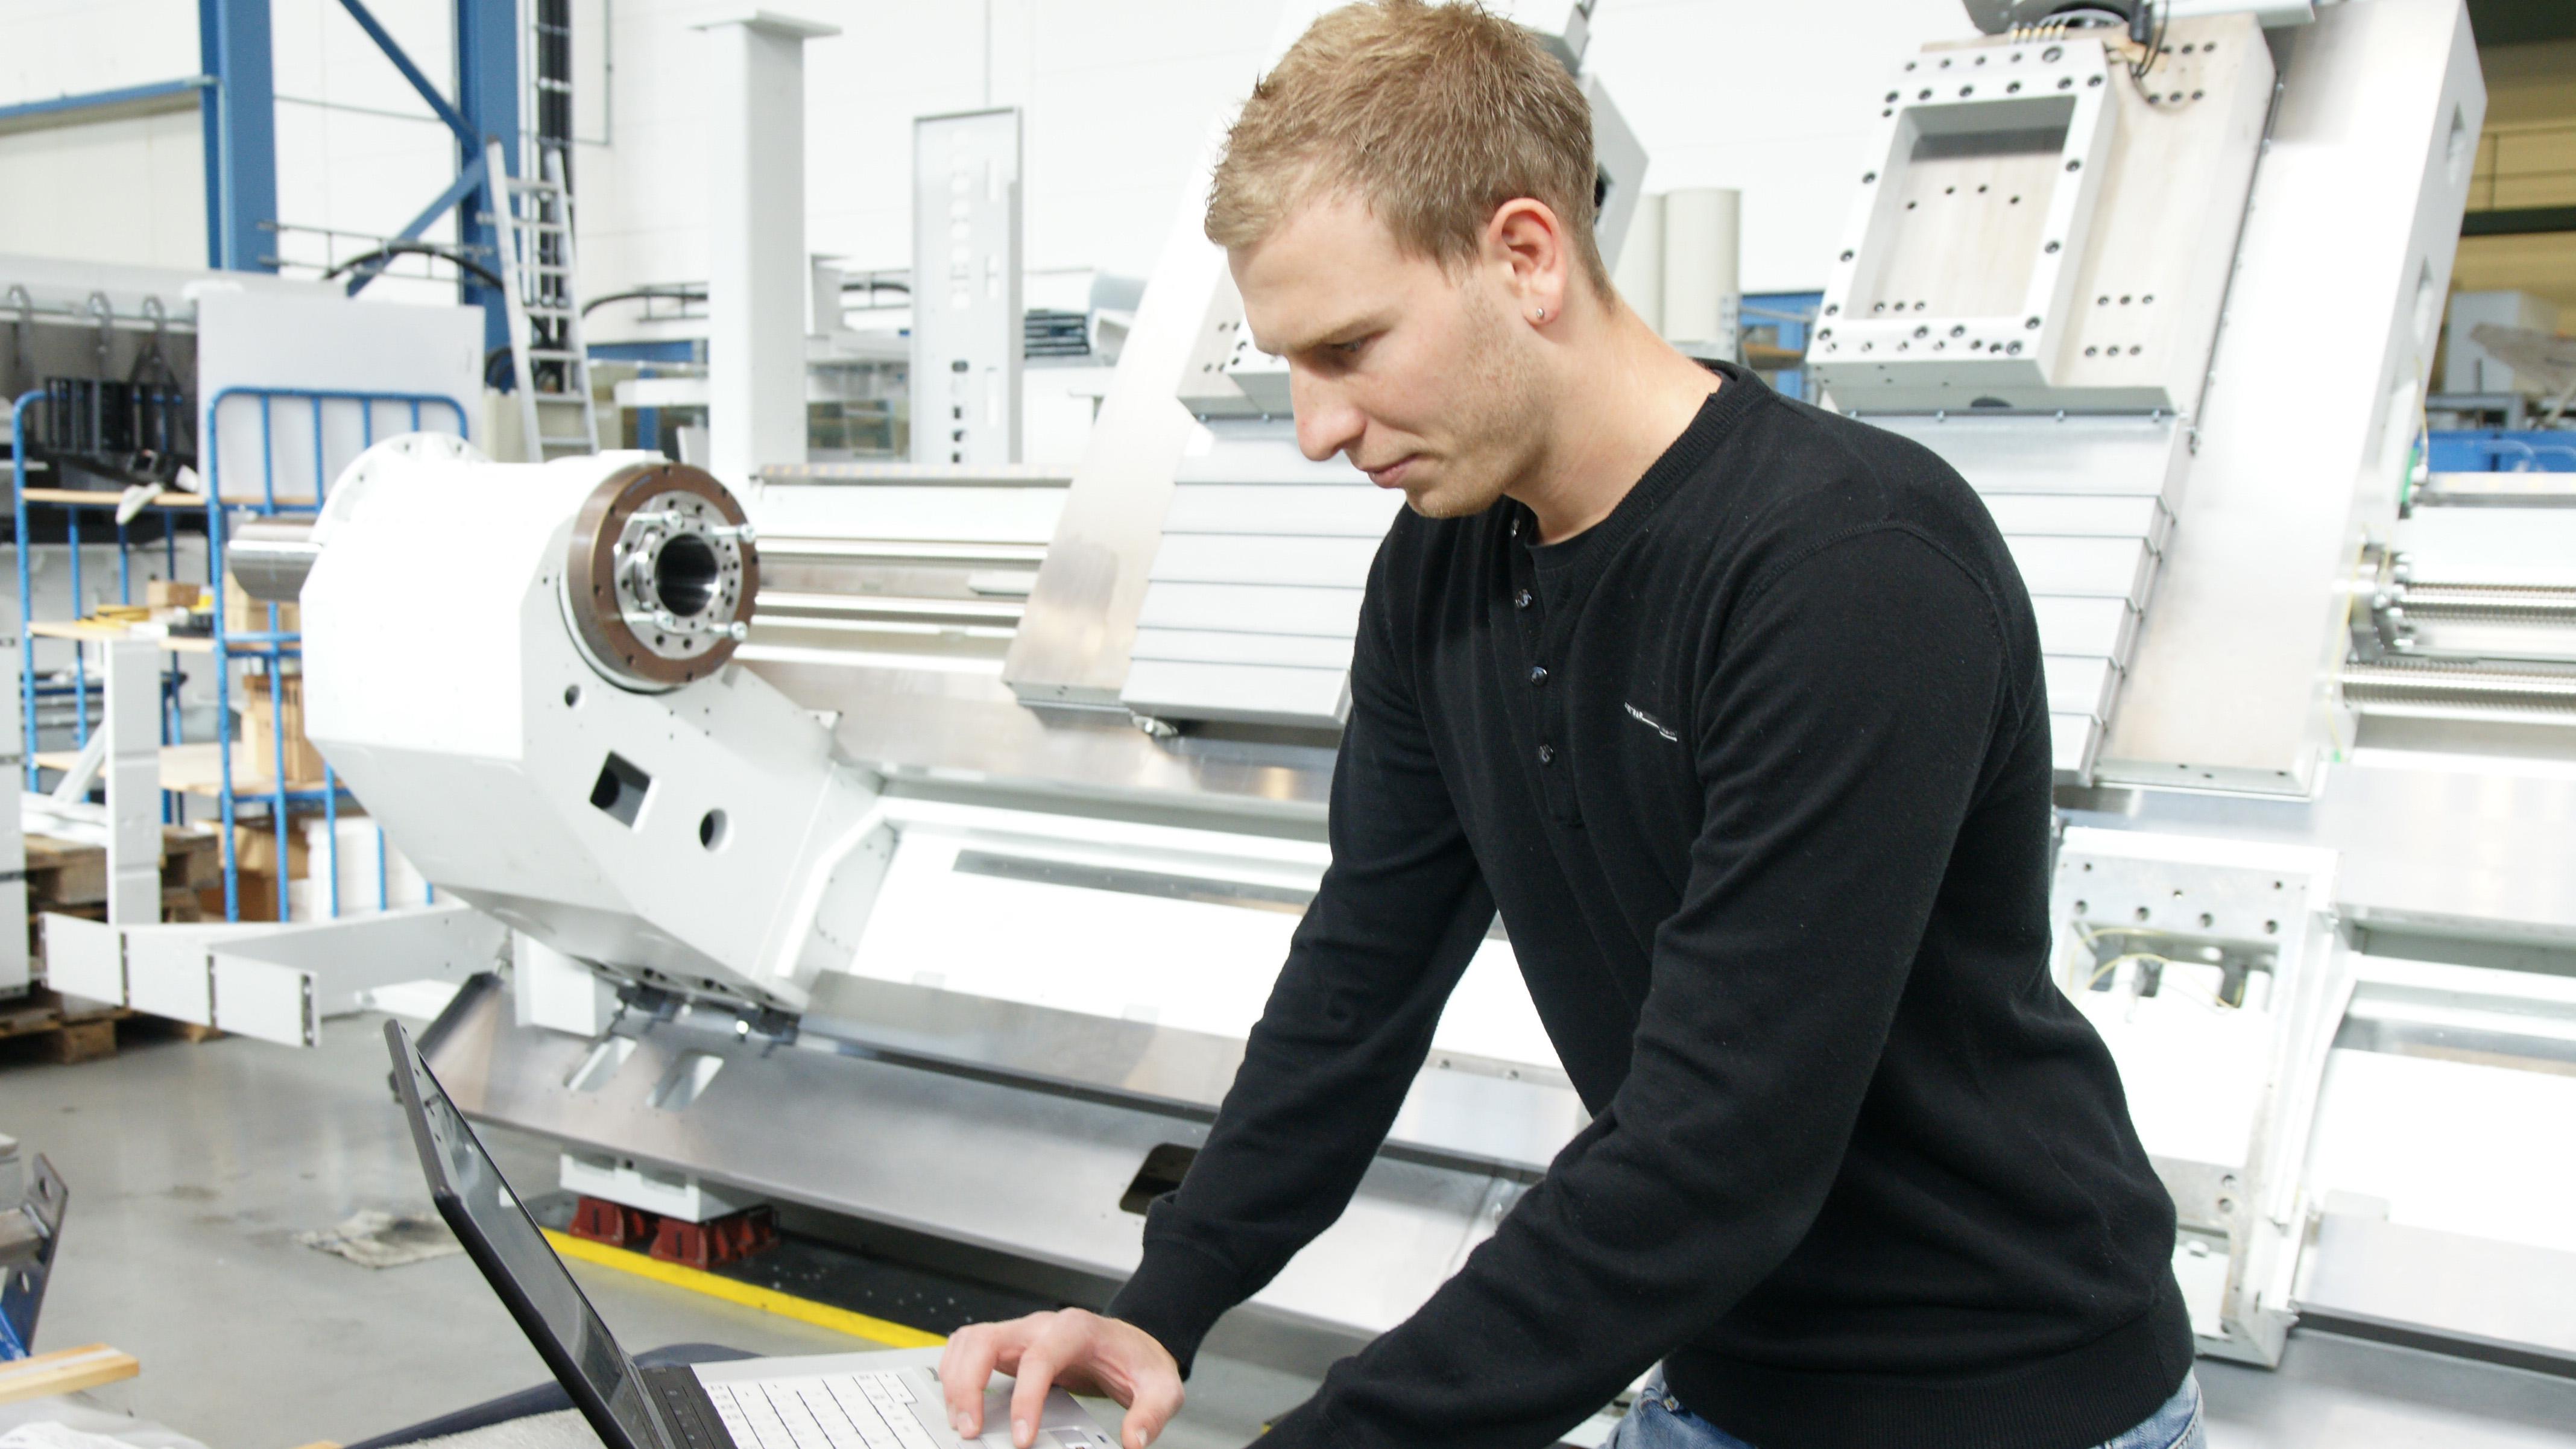 Werkzeugmaschinen Service: Schulung-Programmierung / Machine tool service: Training-Programming / станков Сервис: ИНСТРУКТАЖ ПРОГРАММИСТОВ